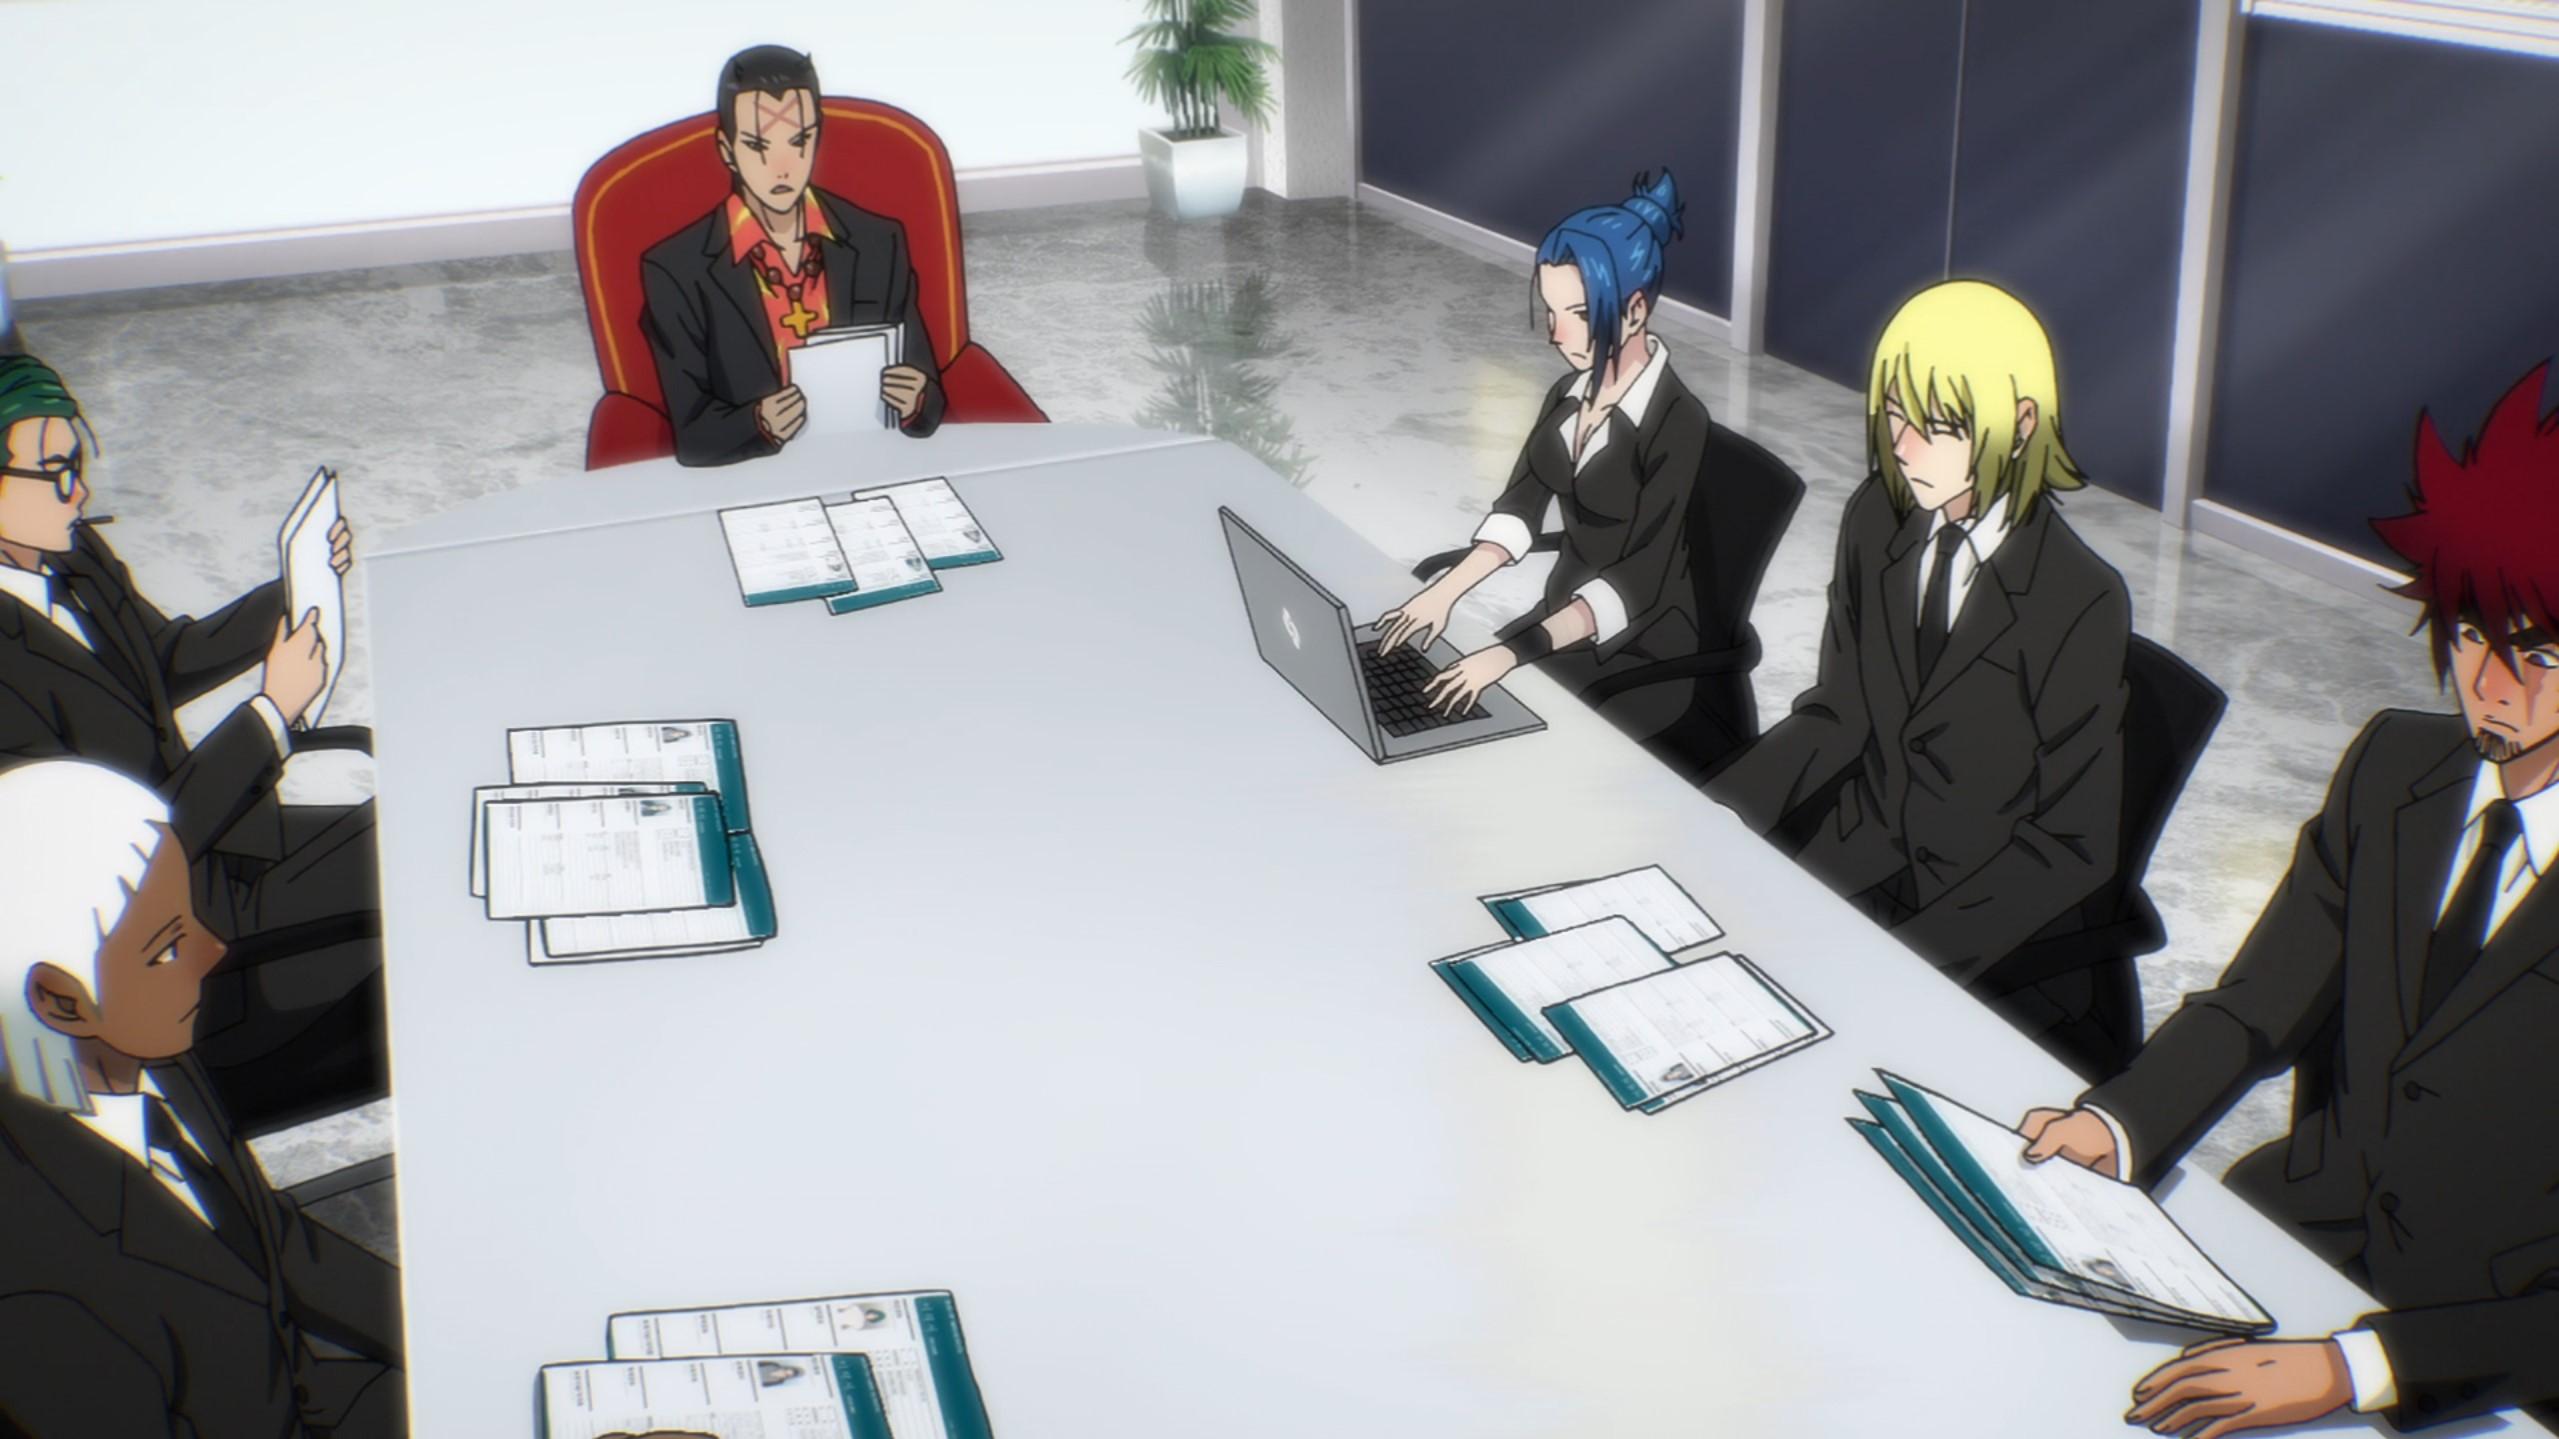 réunion the god of high school episode 6